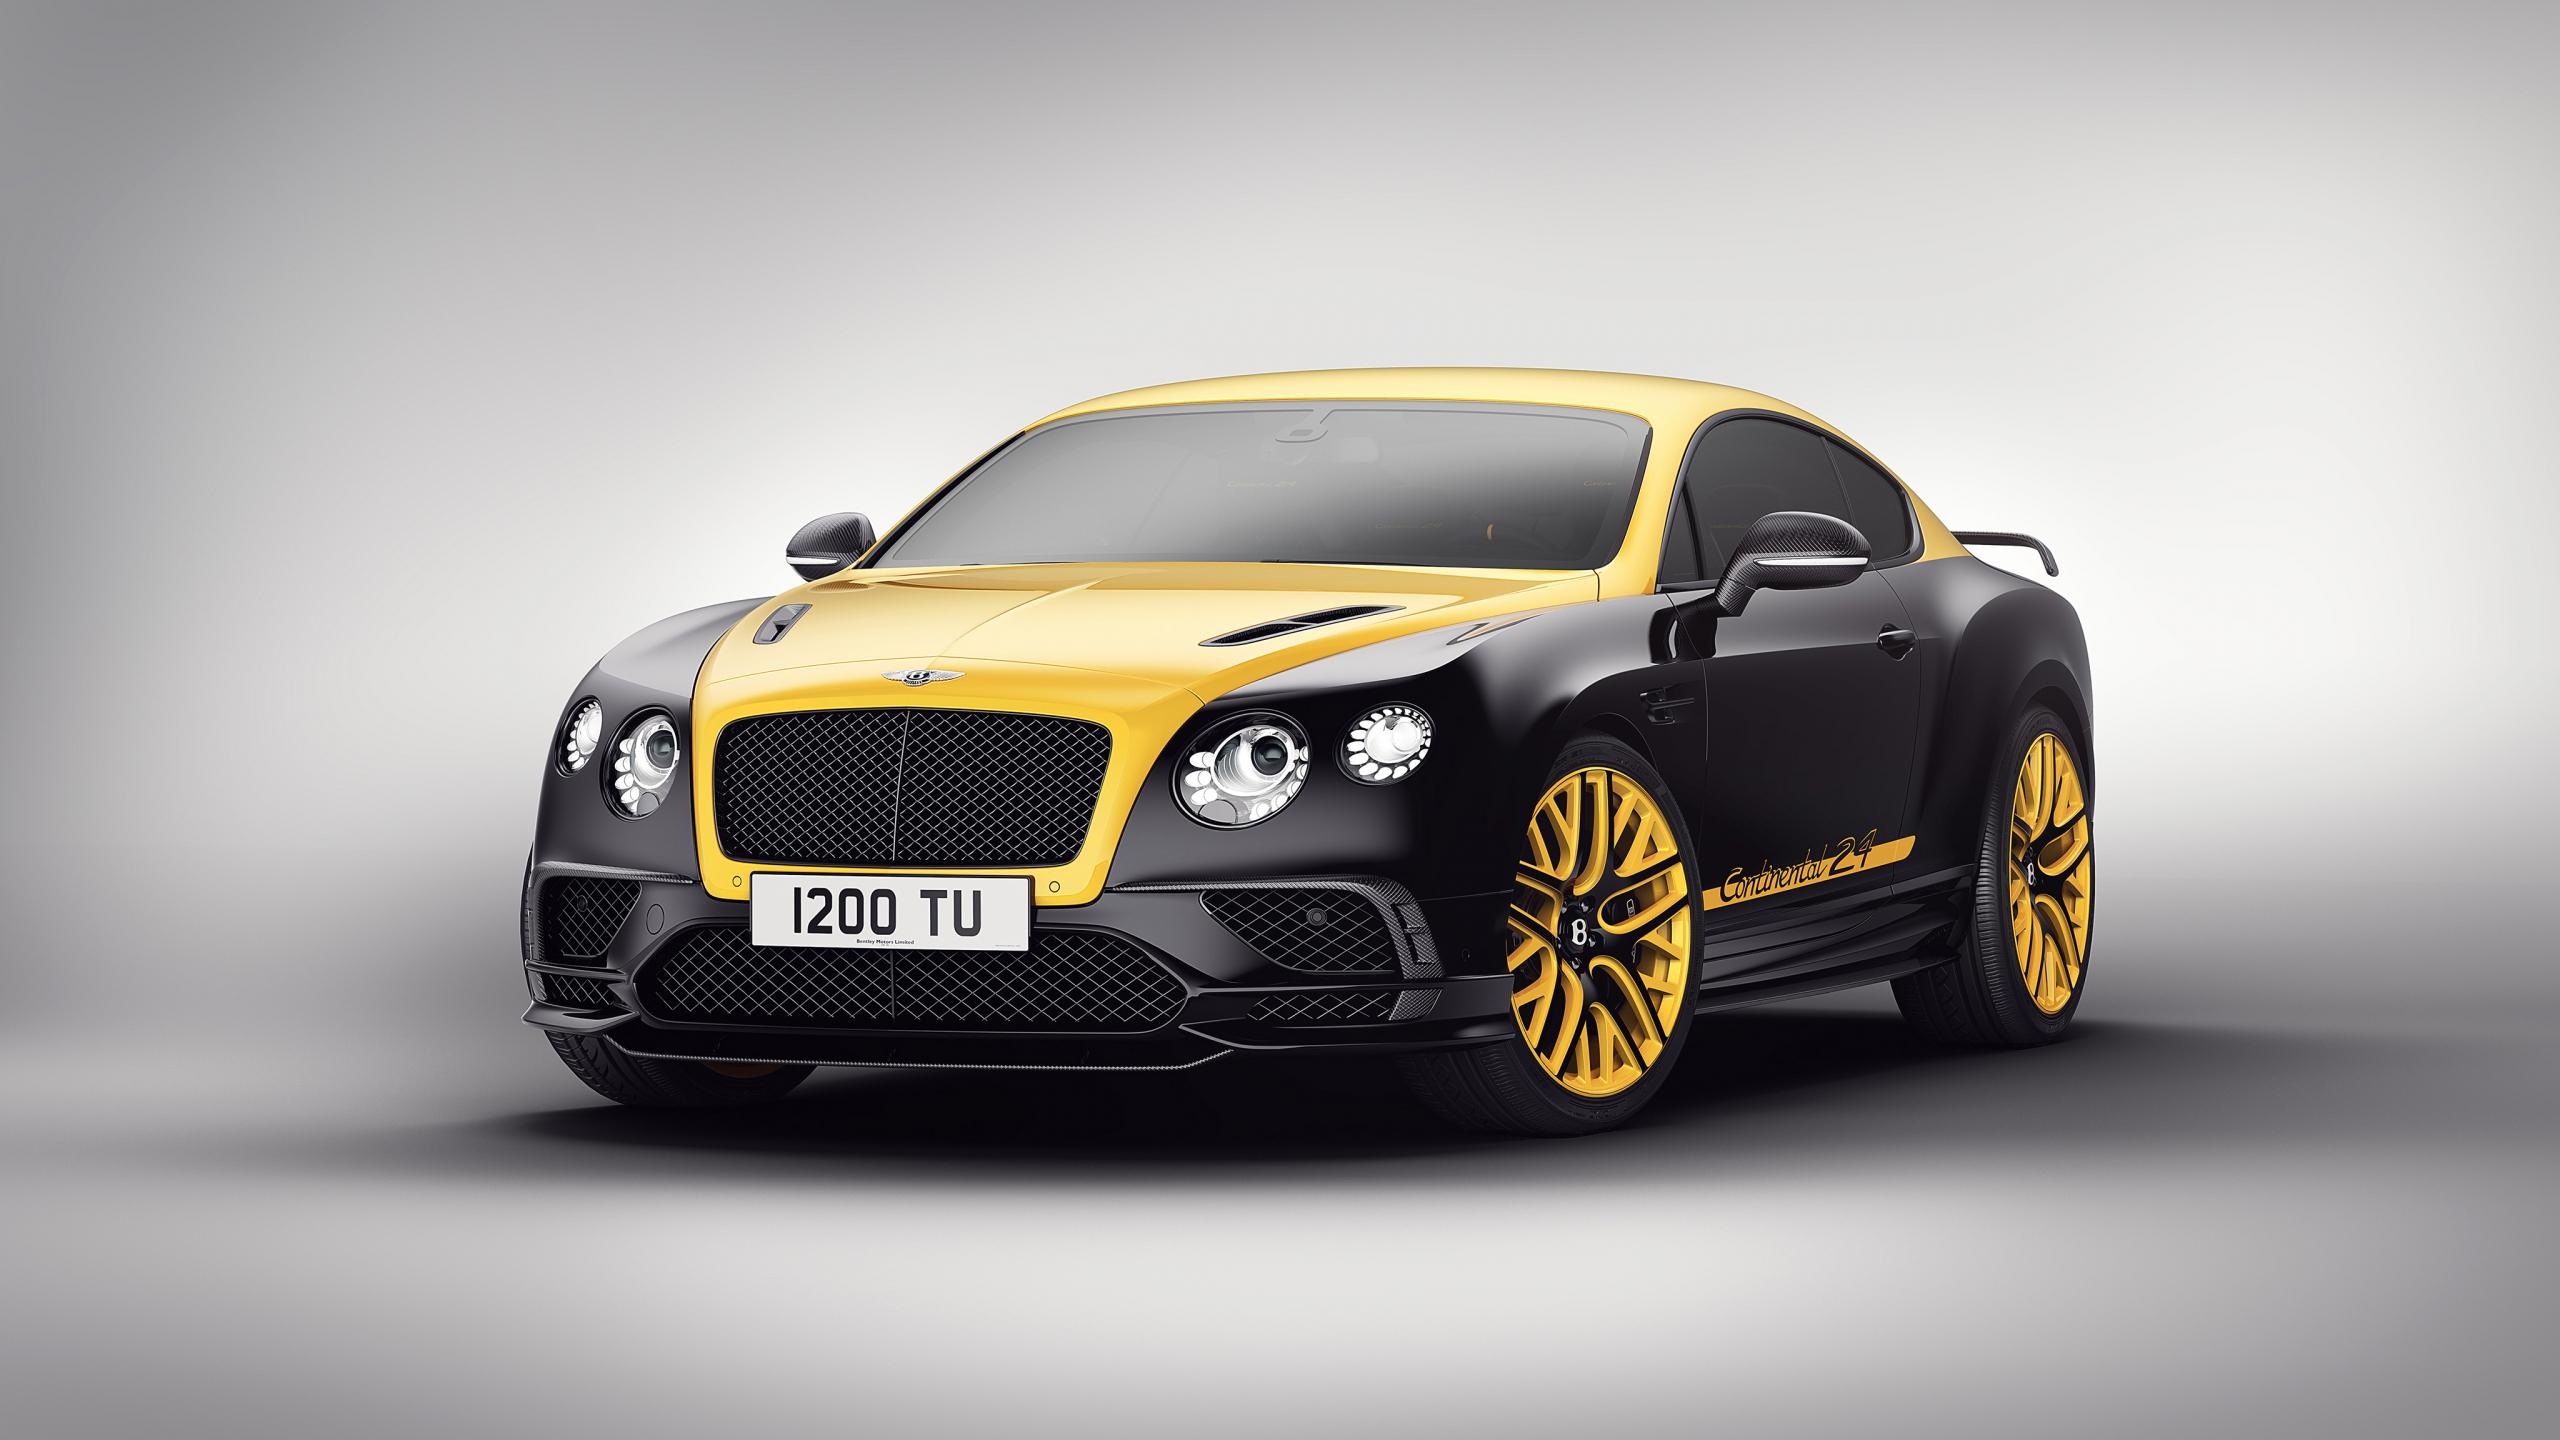 Download 2560x1440 Wallpaper Yellow Black Car Bentley Continental